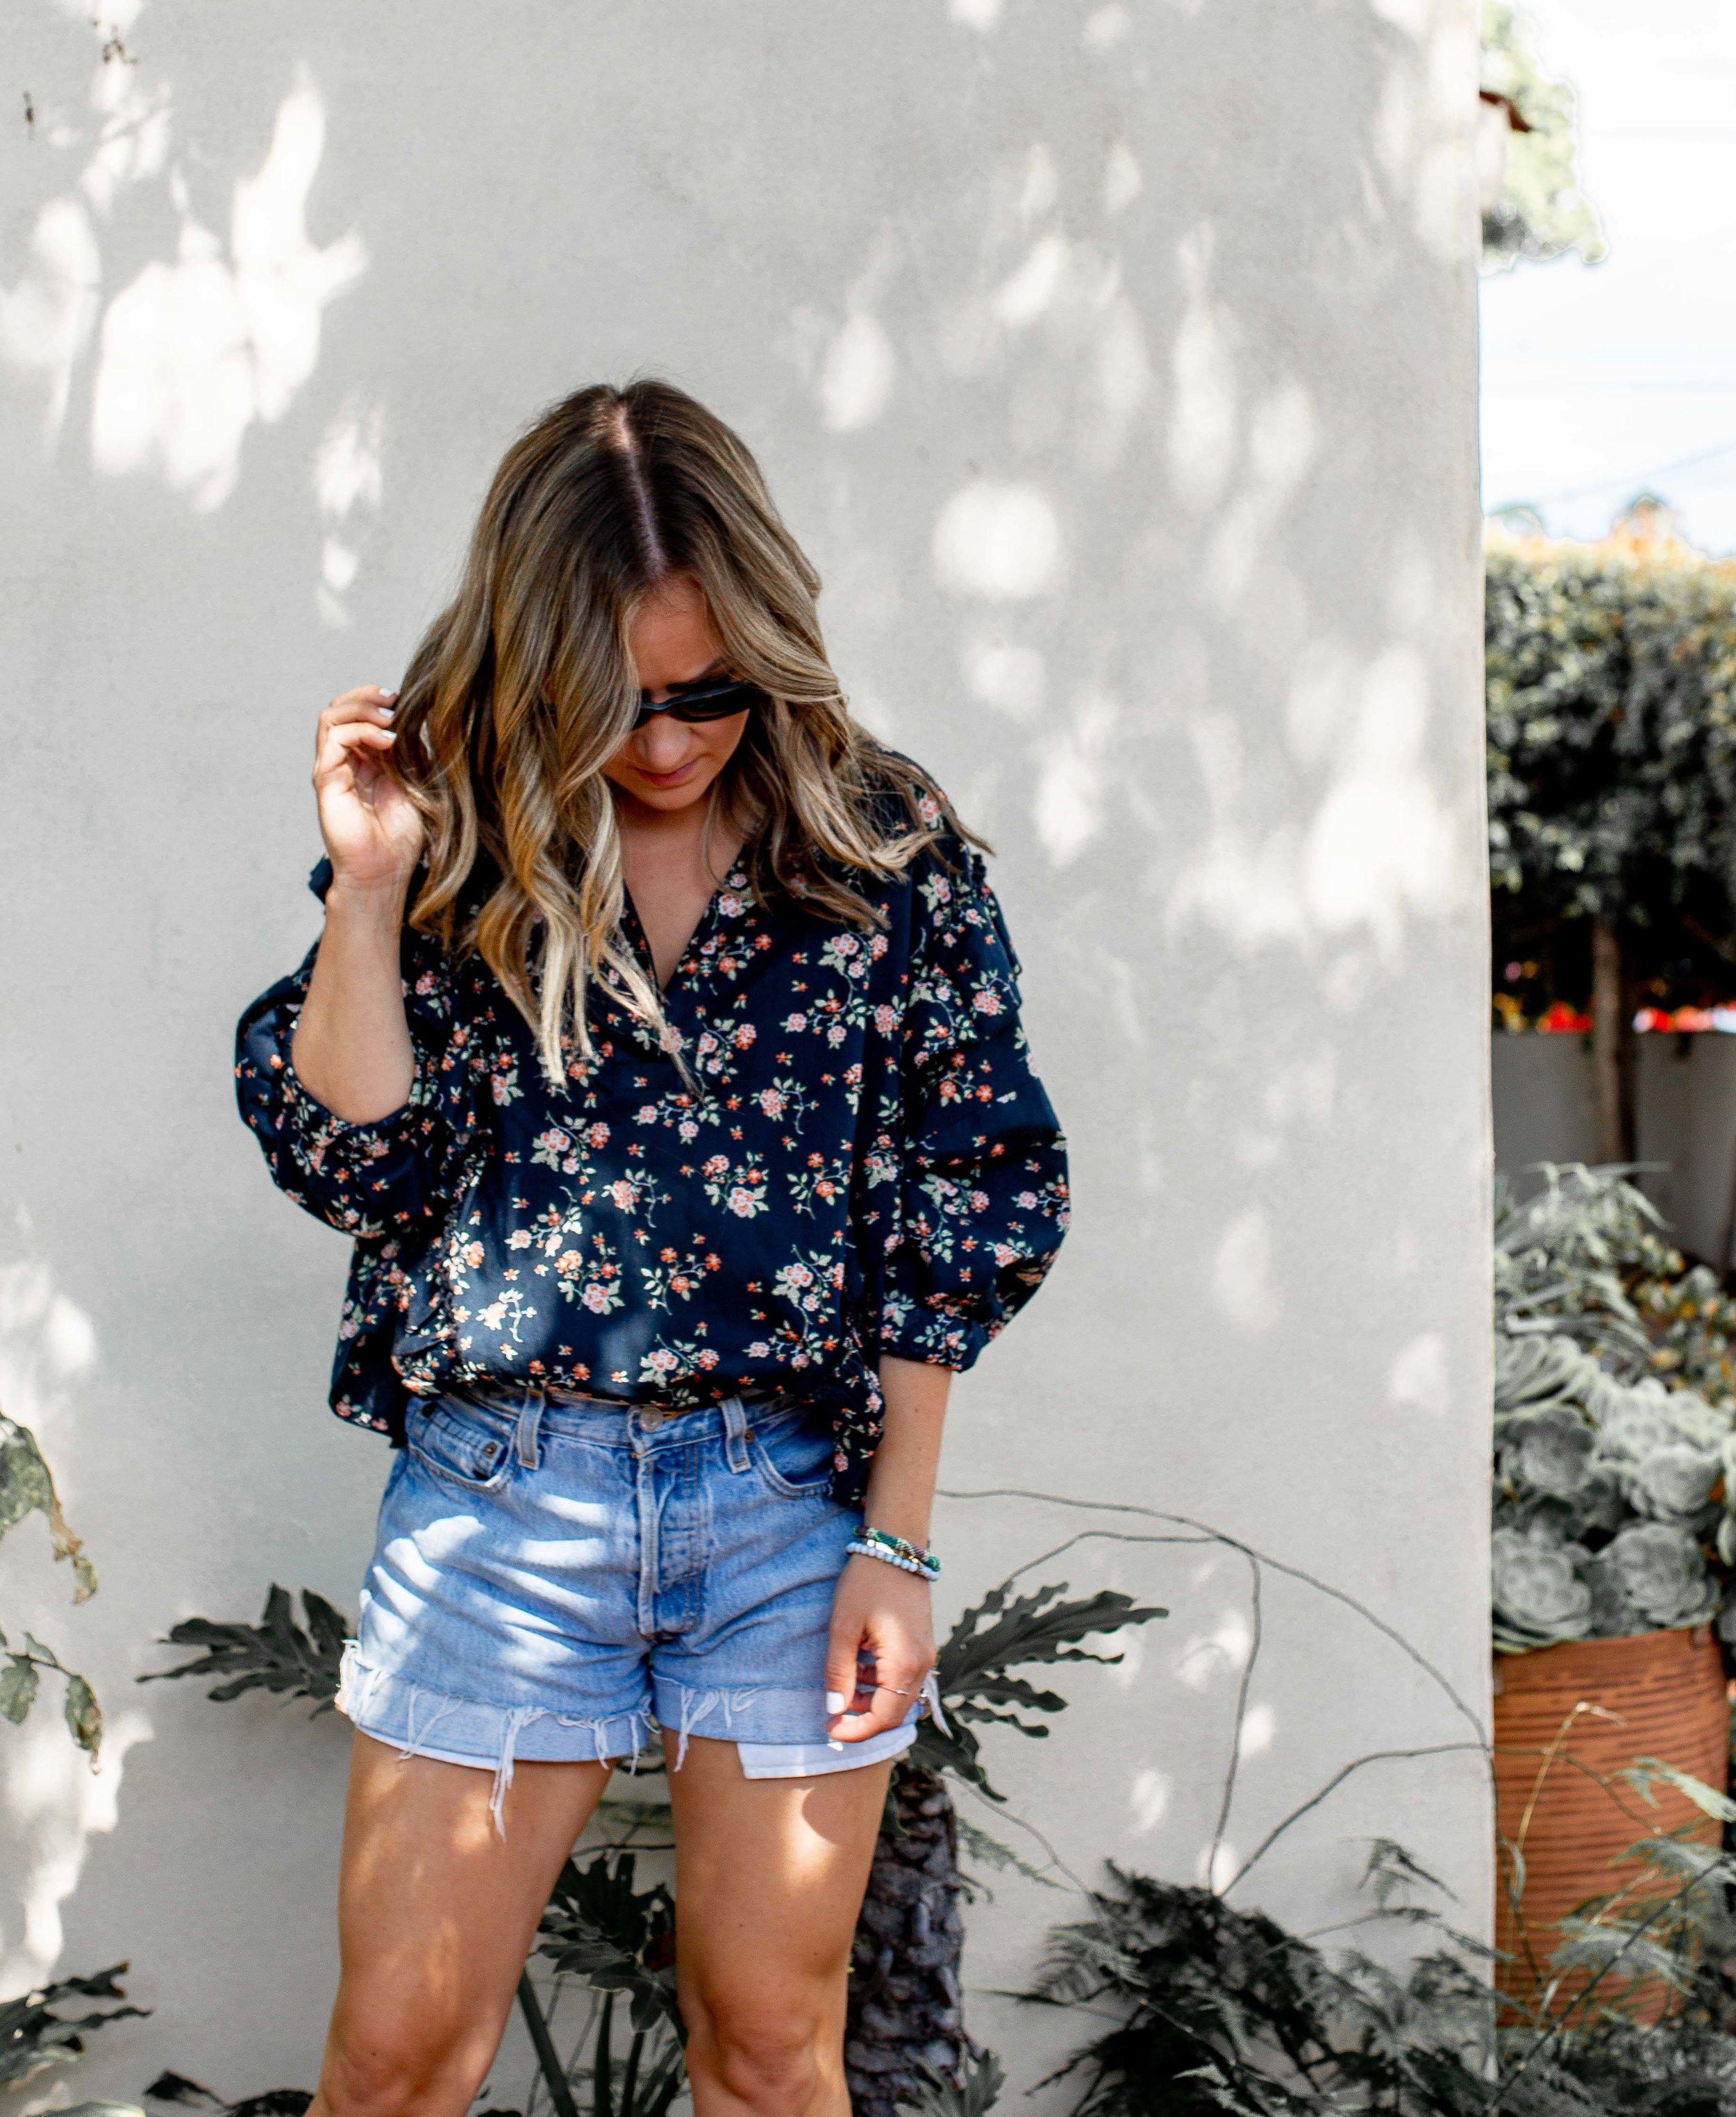 magill-navy-floral-blouse-3.jpg